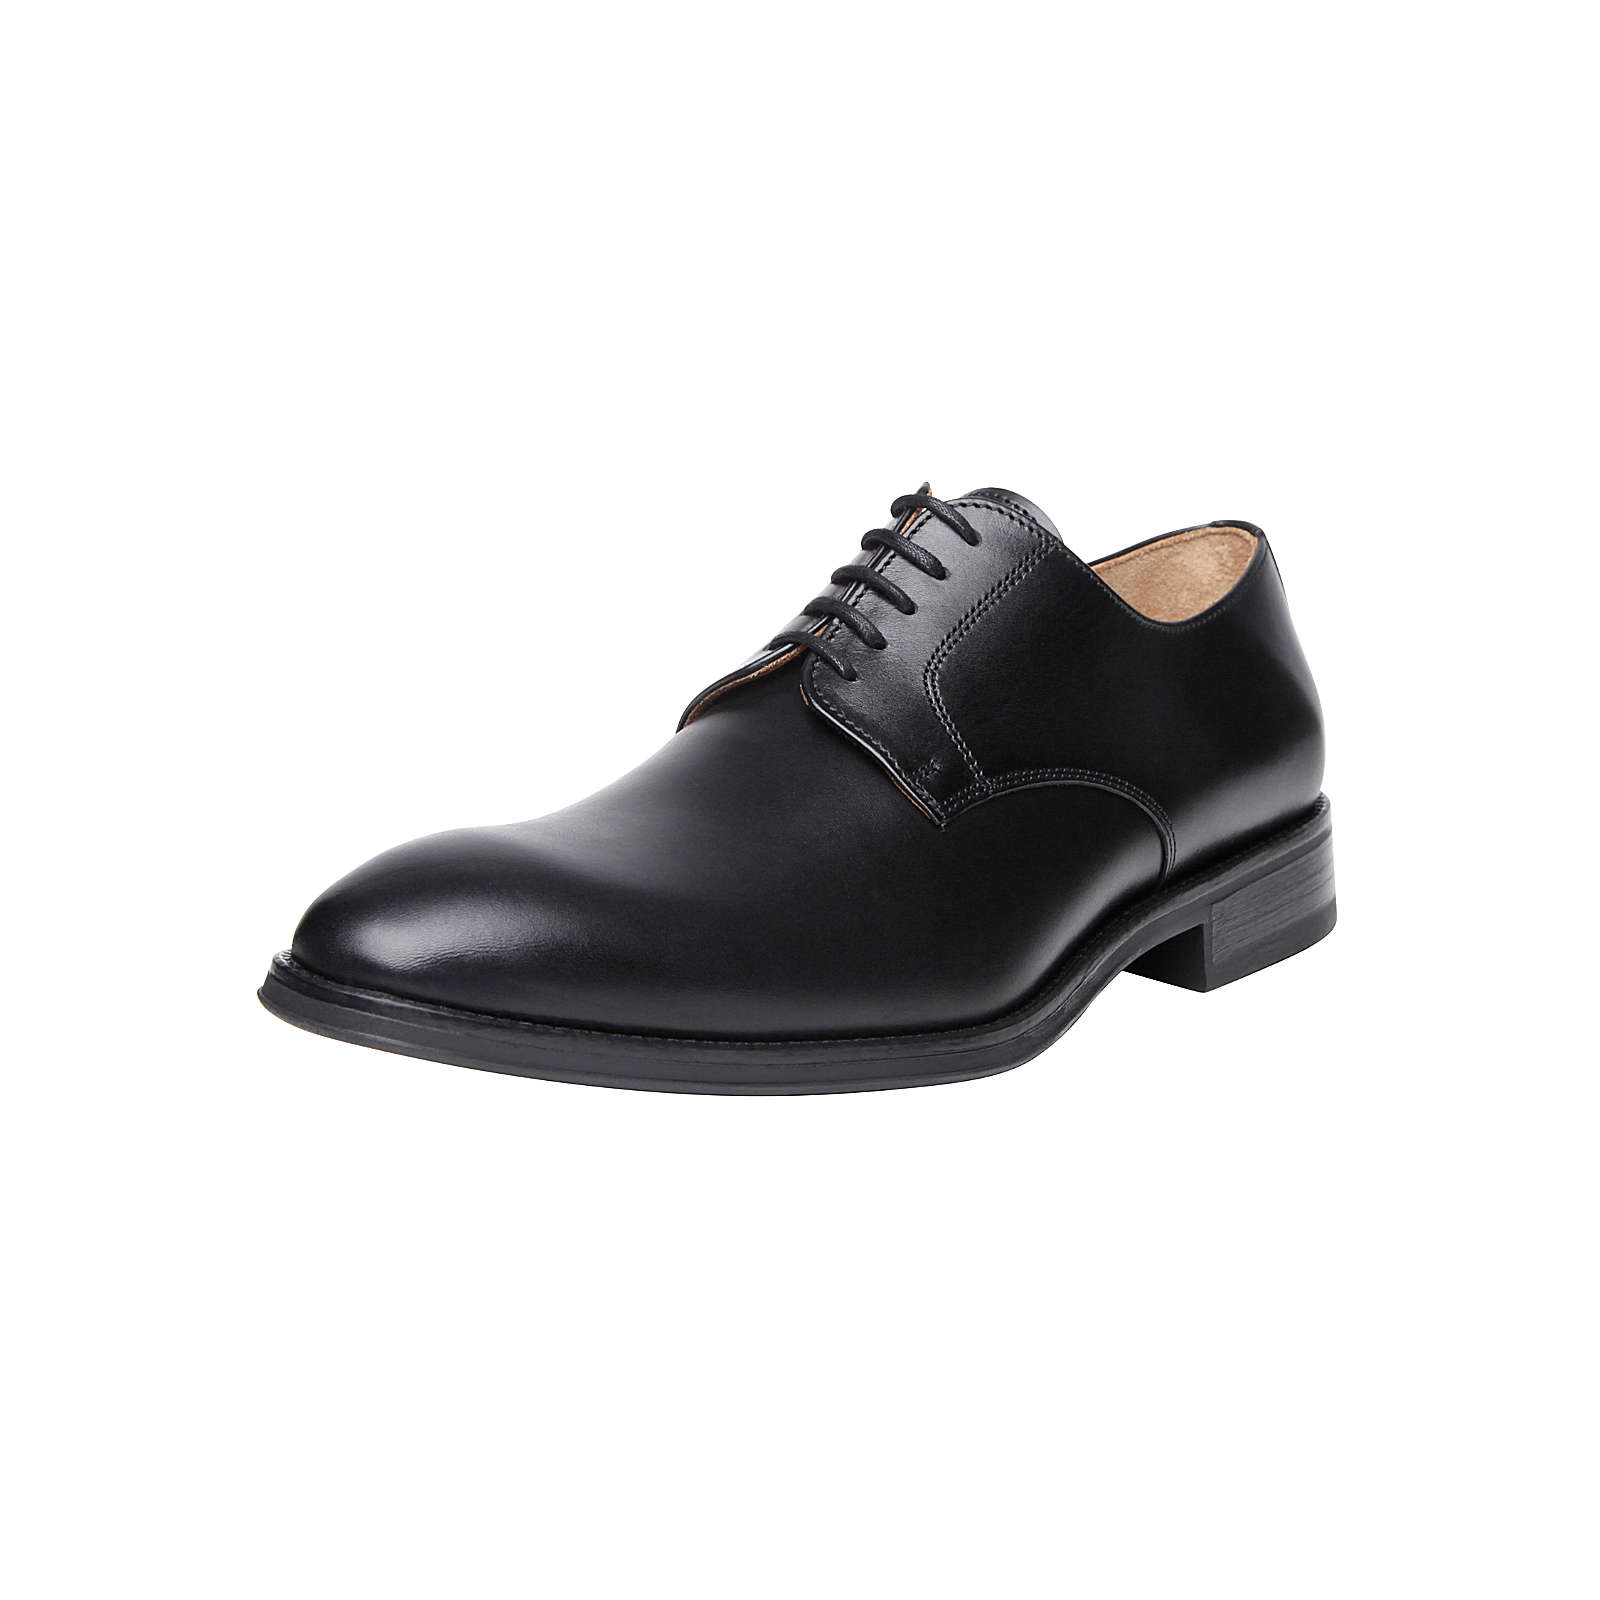 Shoepassion Halbschuhe No. 502 SC Business-Schnürschuhe schwarz Herren Gr. 41